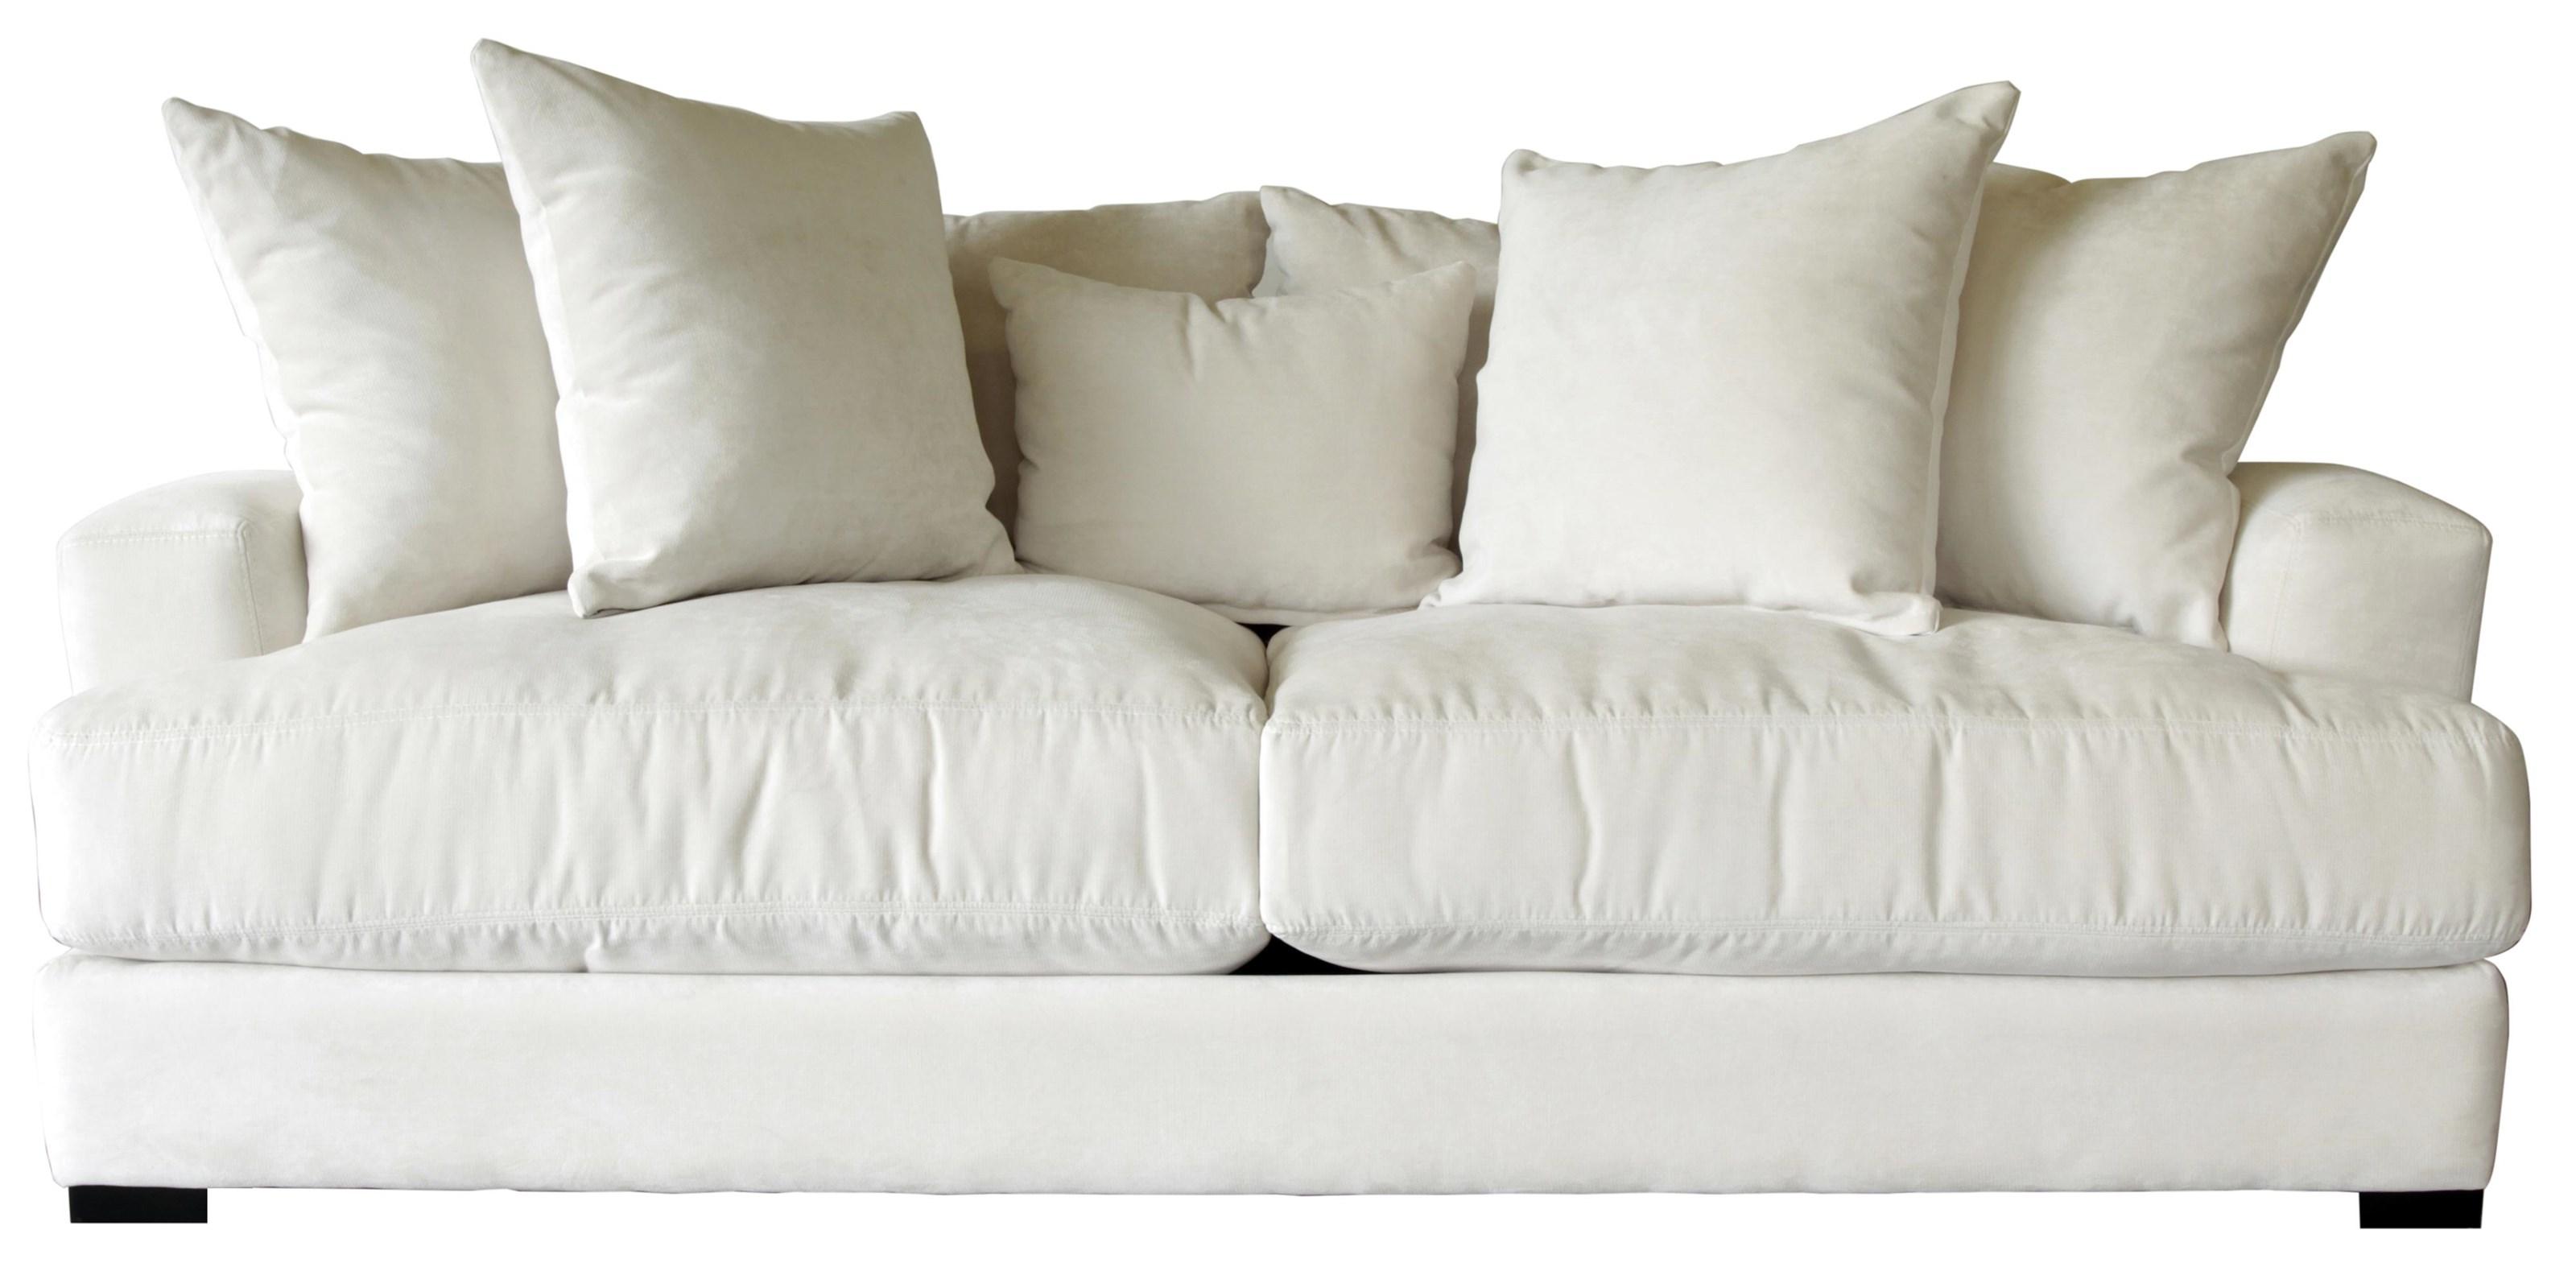 z gallerie stella sofa cleaning micasa bettsofa knecht jonathan louis homeworld furniture sofas